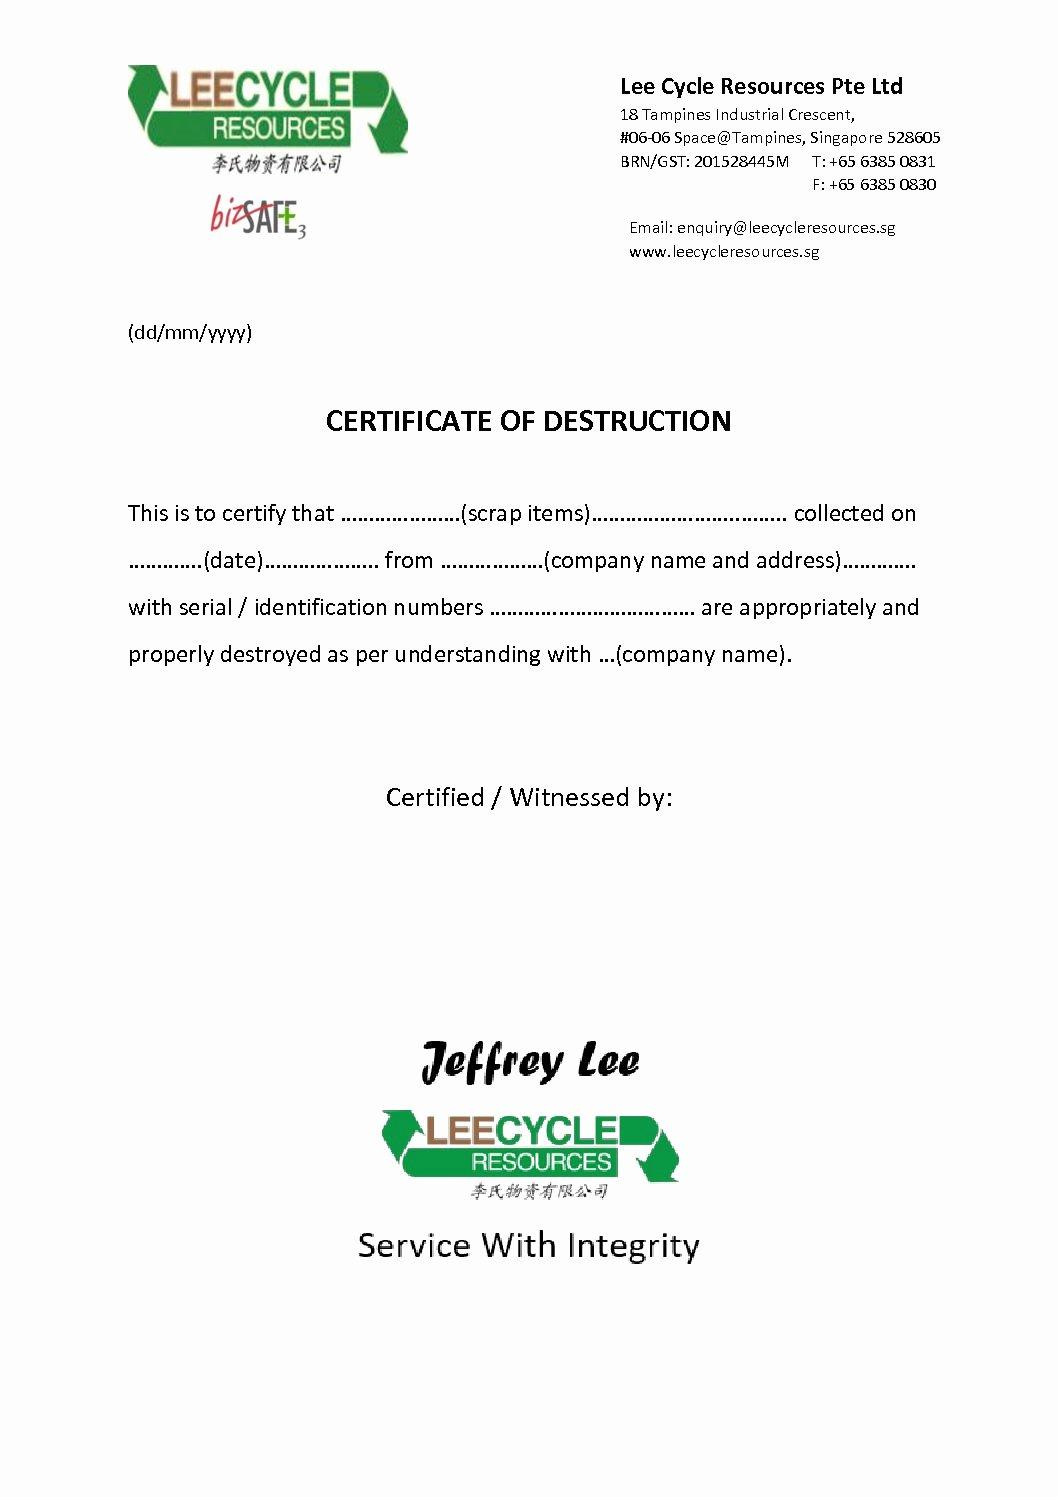 Certificate Of Destruction Template Luxury Certificate Destruction Leecycle Resources Singapore